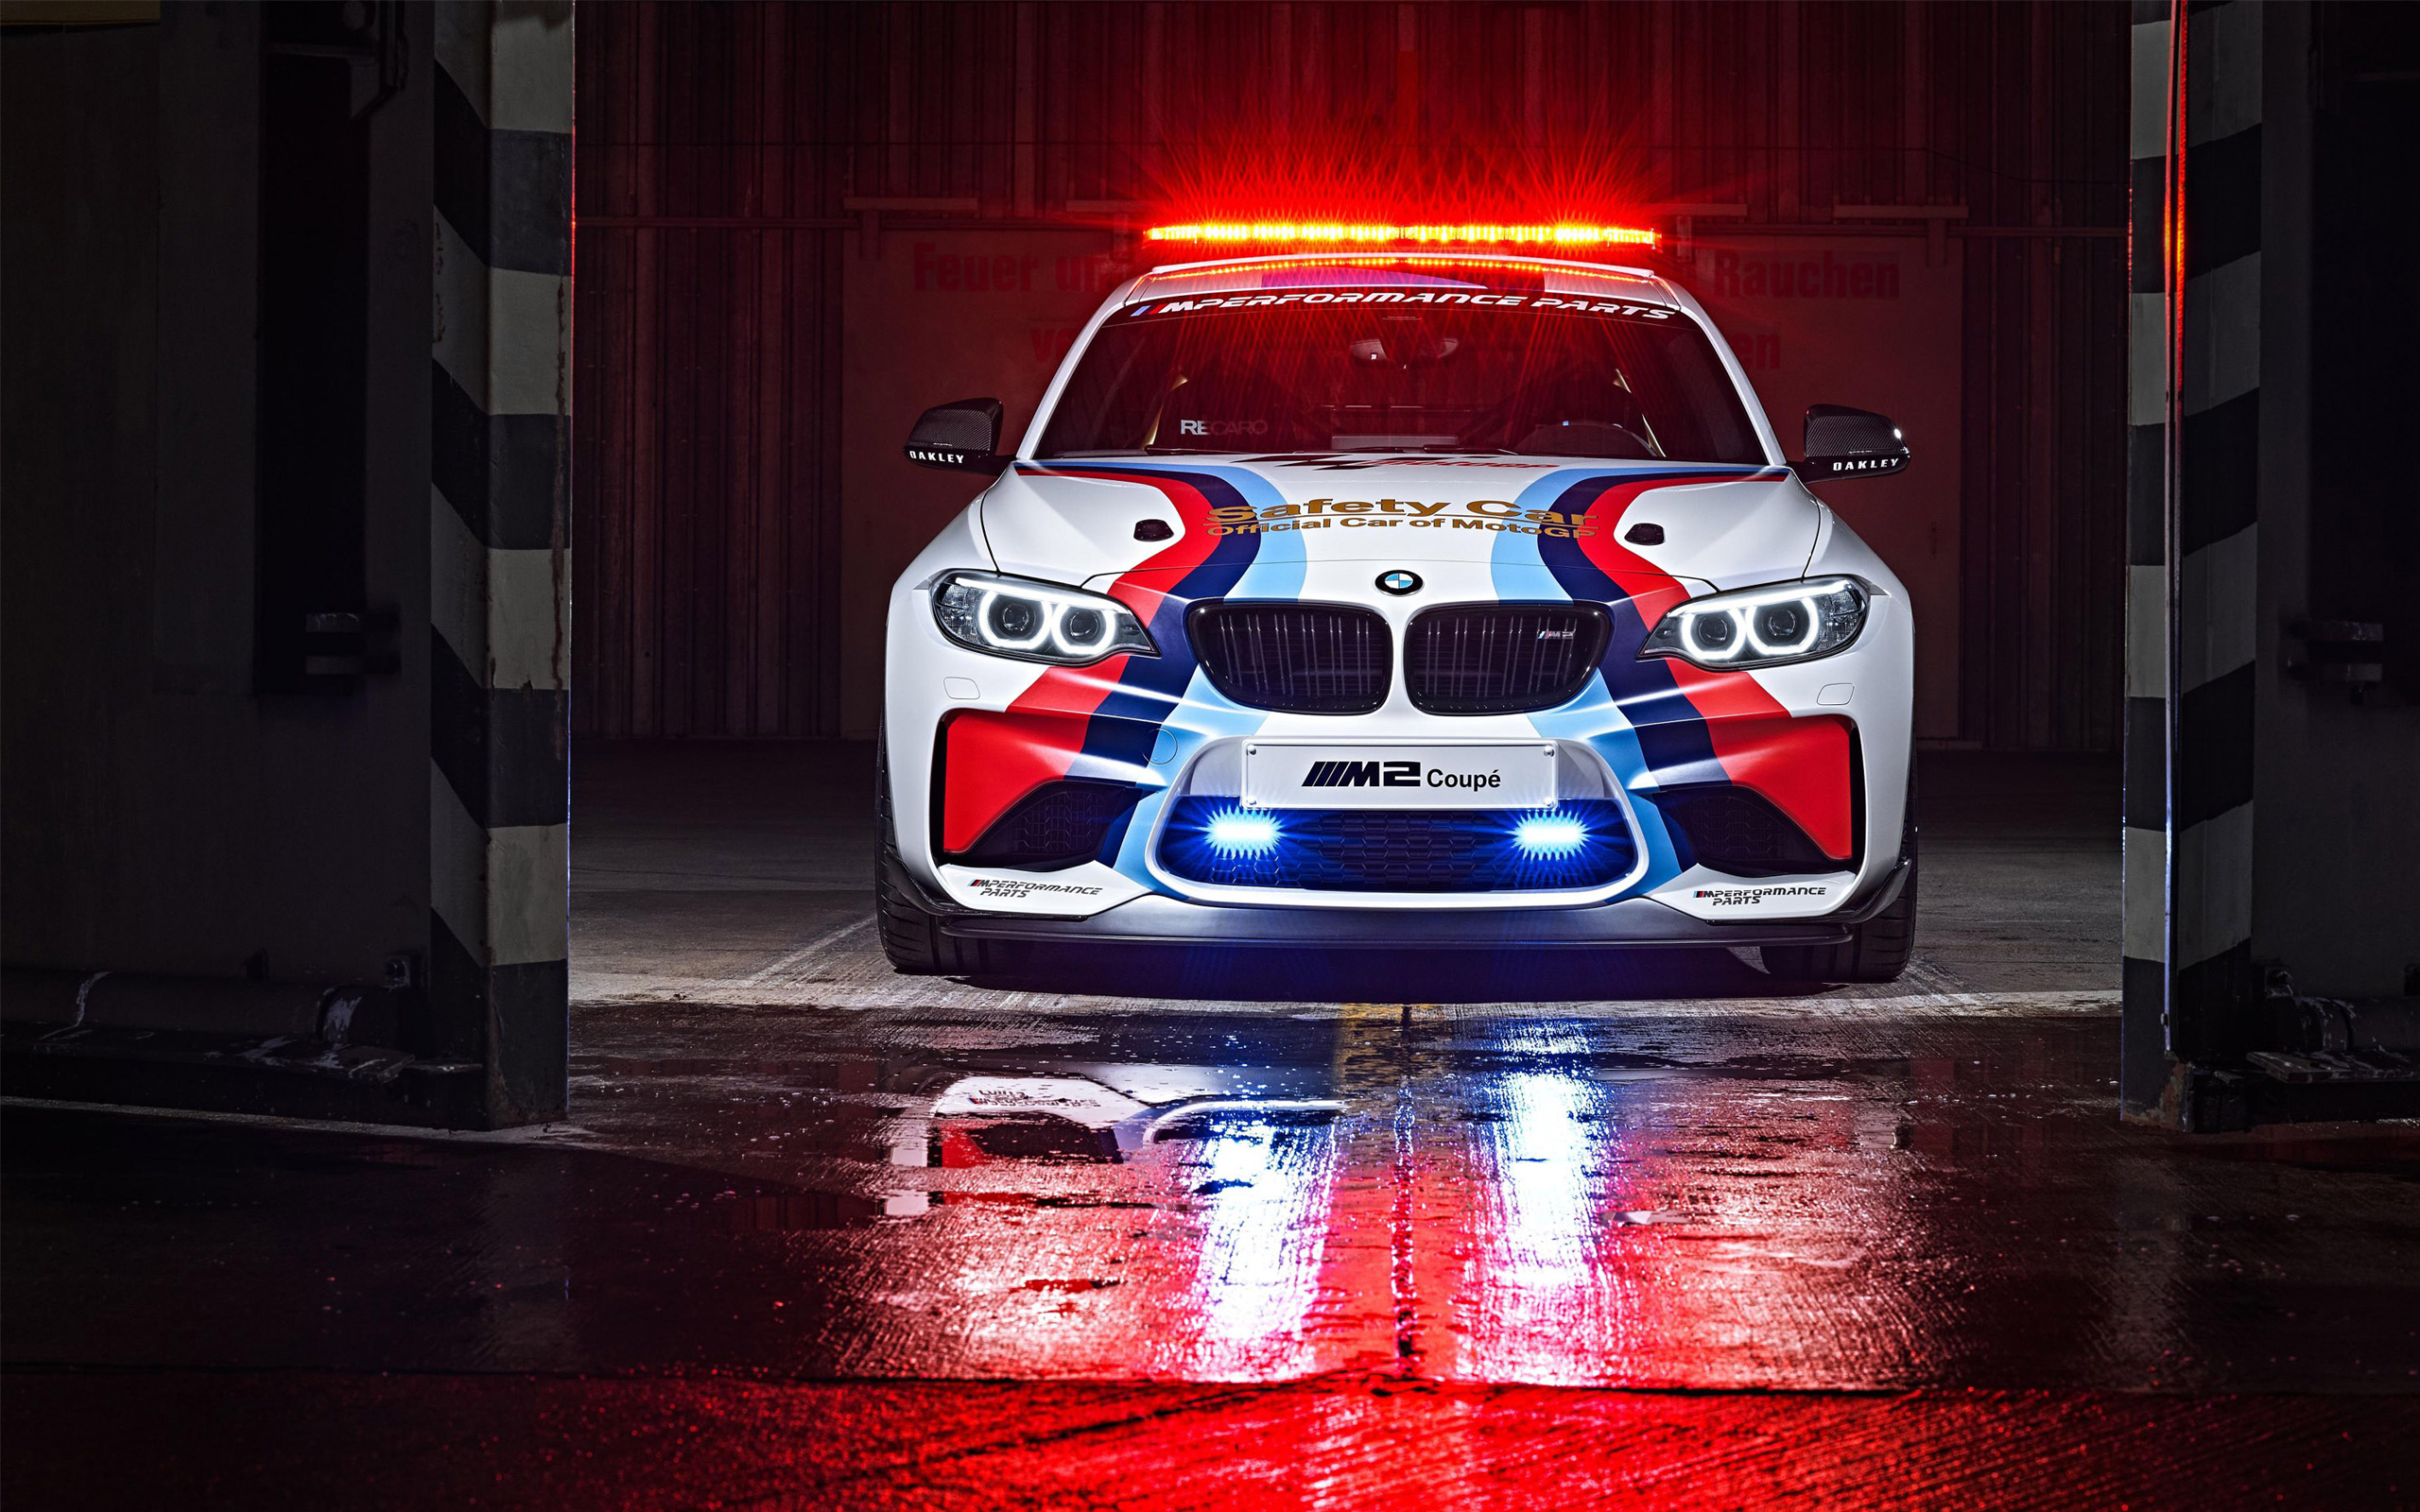 2016 BMW M2 Motogp Safety Car Wallpaper | HD Car ...